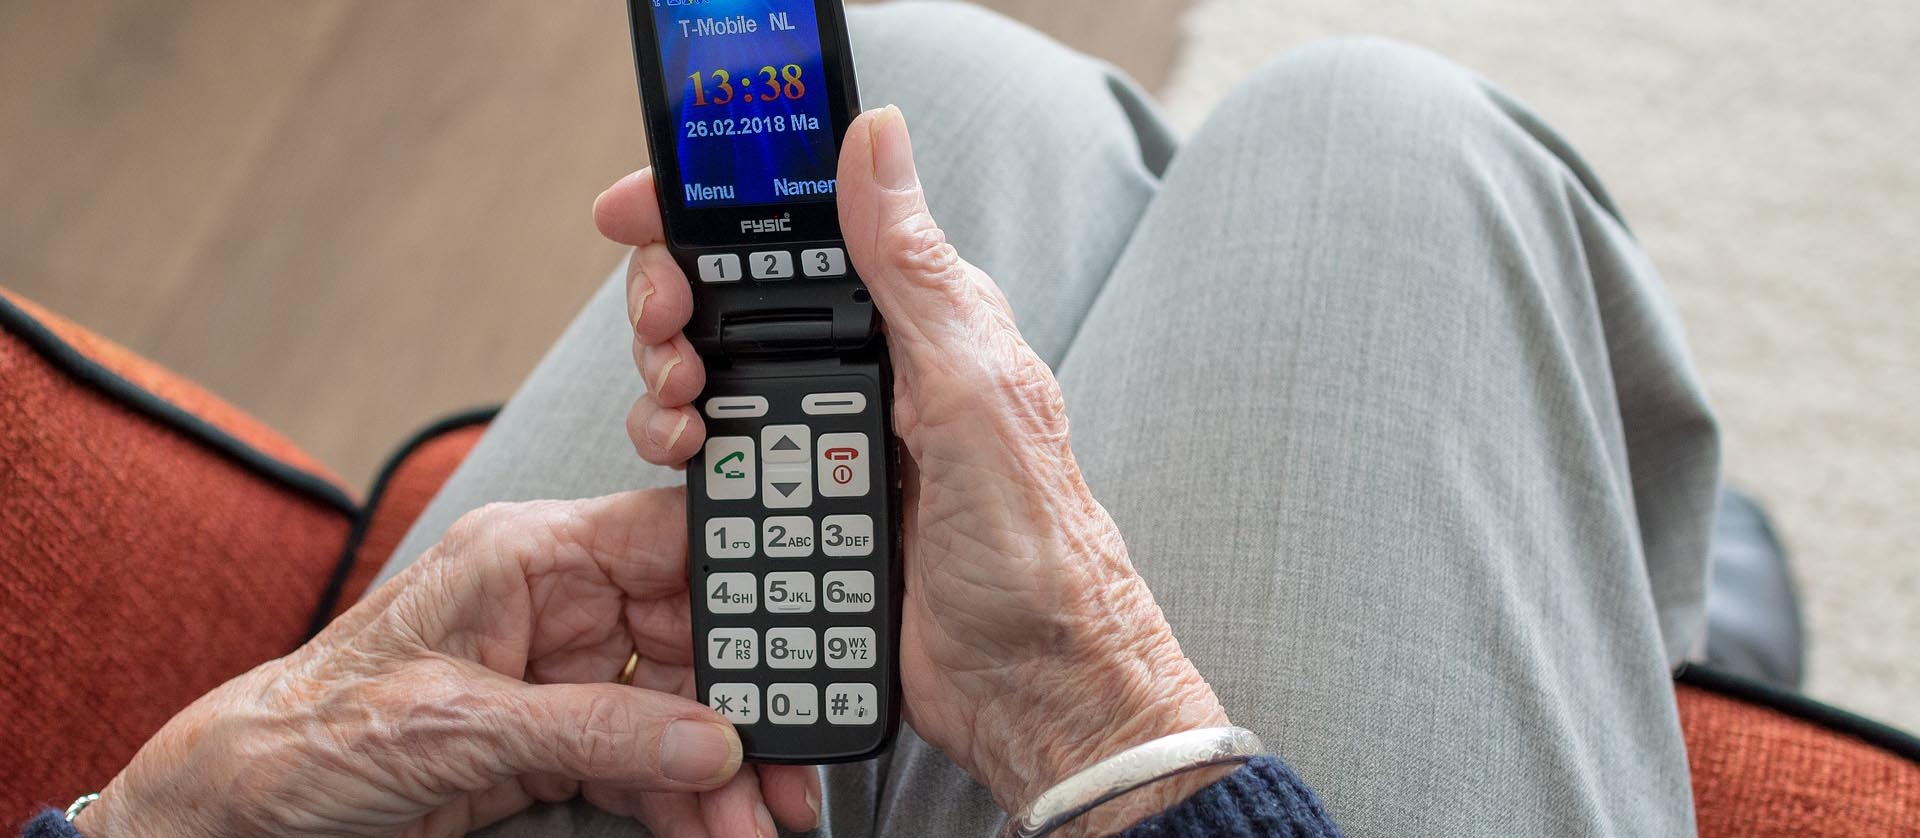 teléfono móvil para personas mayores 2019